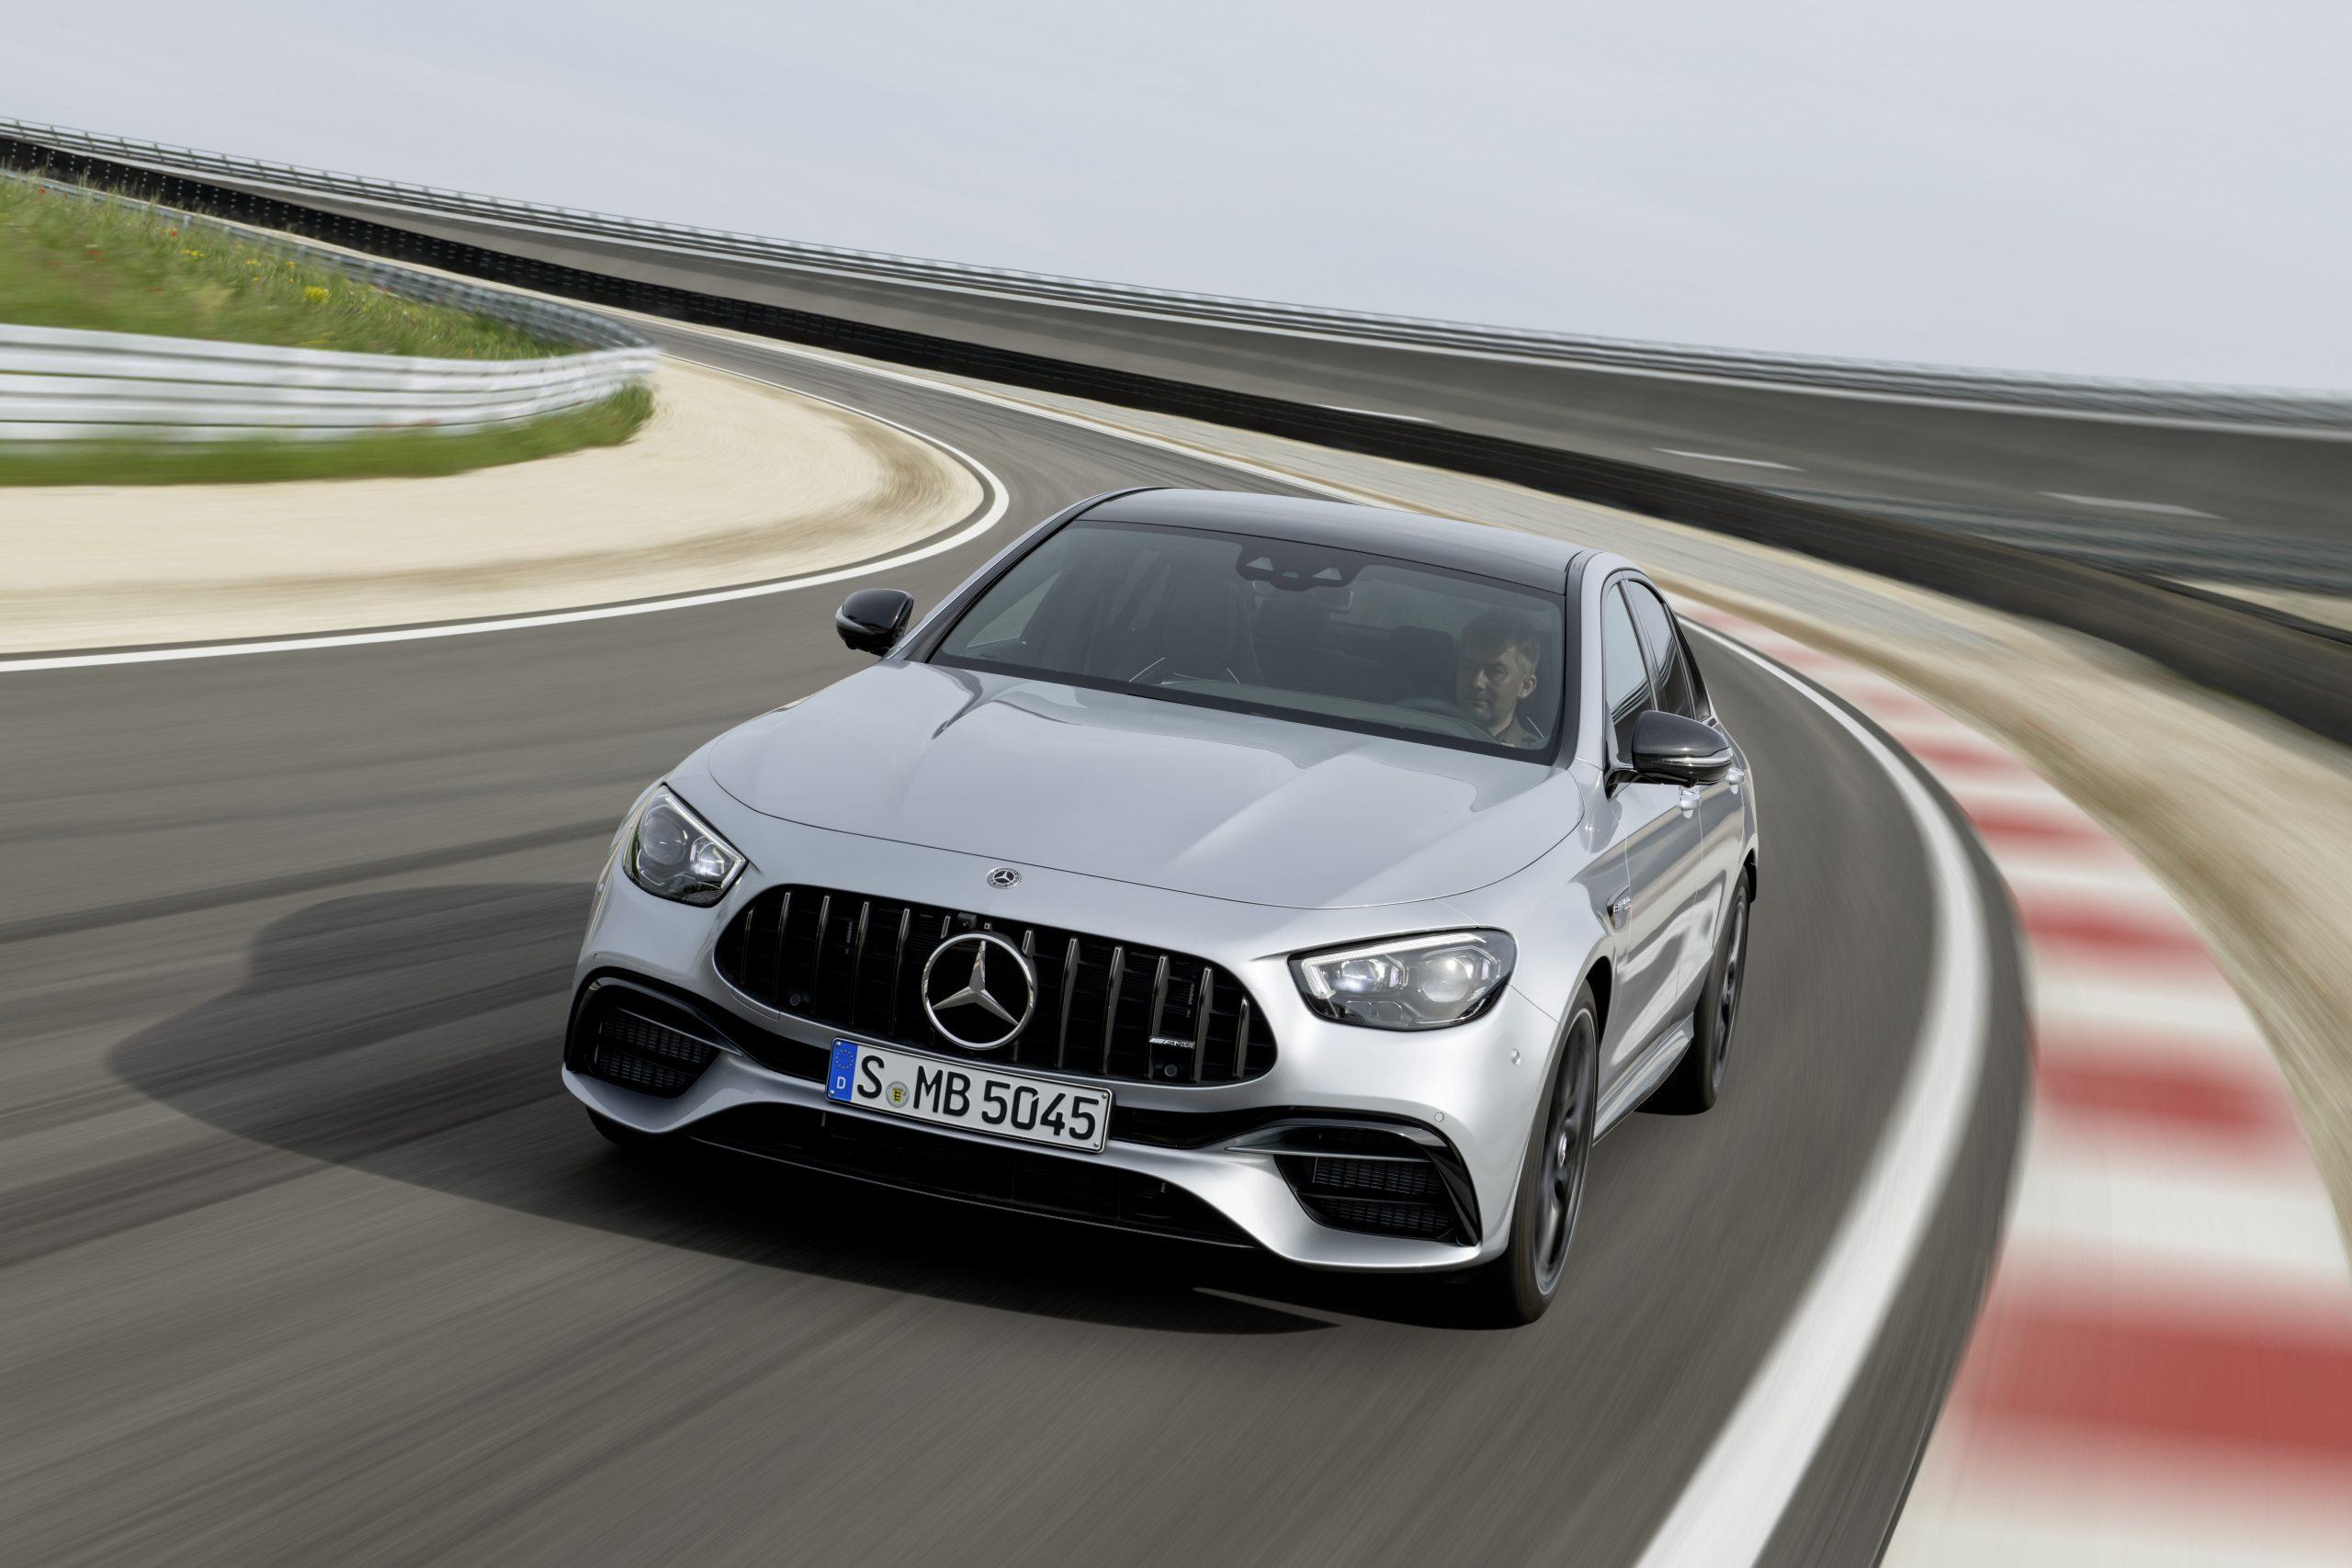 2021 Mercedes-AMG E63 S sedan on track